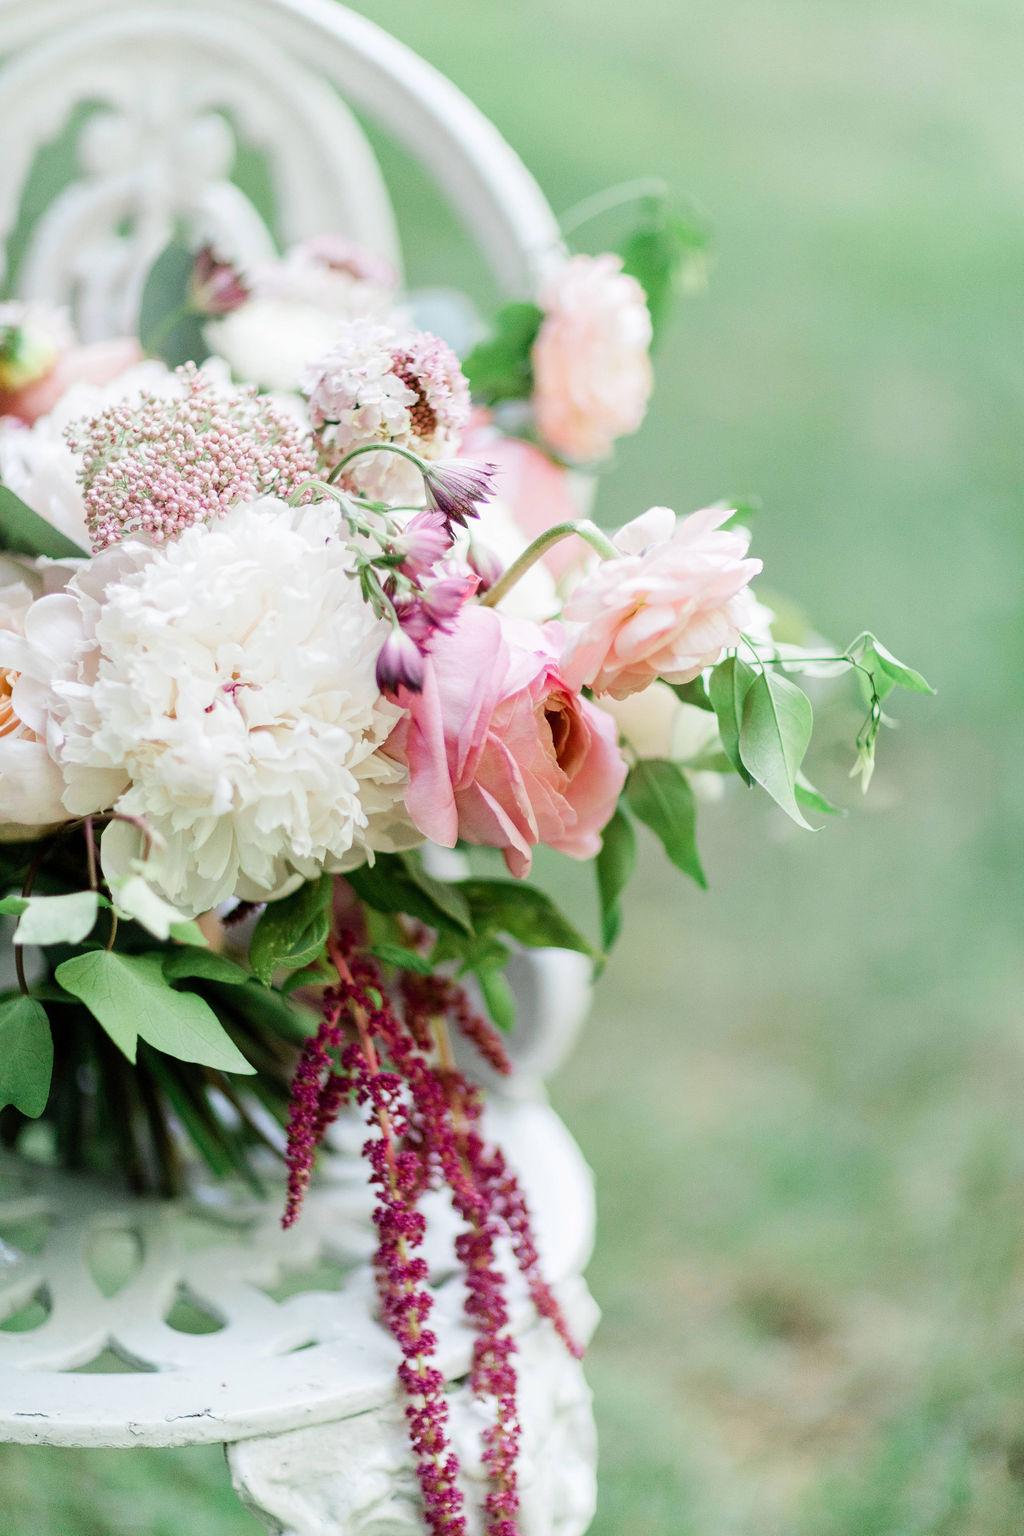 Kurtz-Orchards-Niagara-on-the-Lake-Styled-Wedding-Session-Shotlife-Studio-Calderone-Co-Luxury-Events-Vineyard-Bride-02.JPG